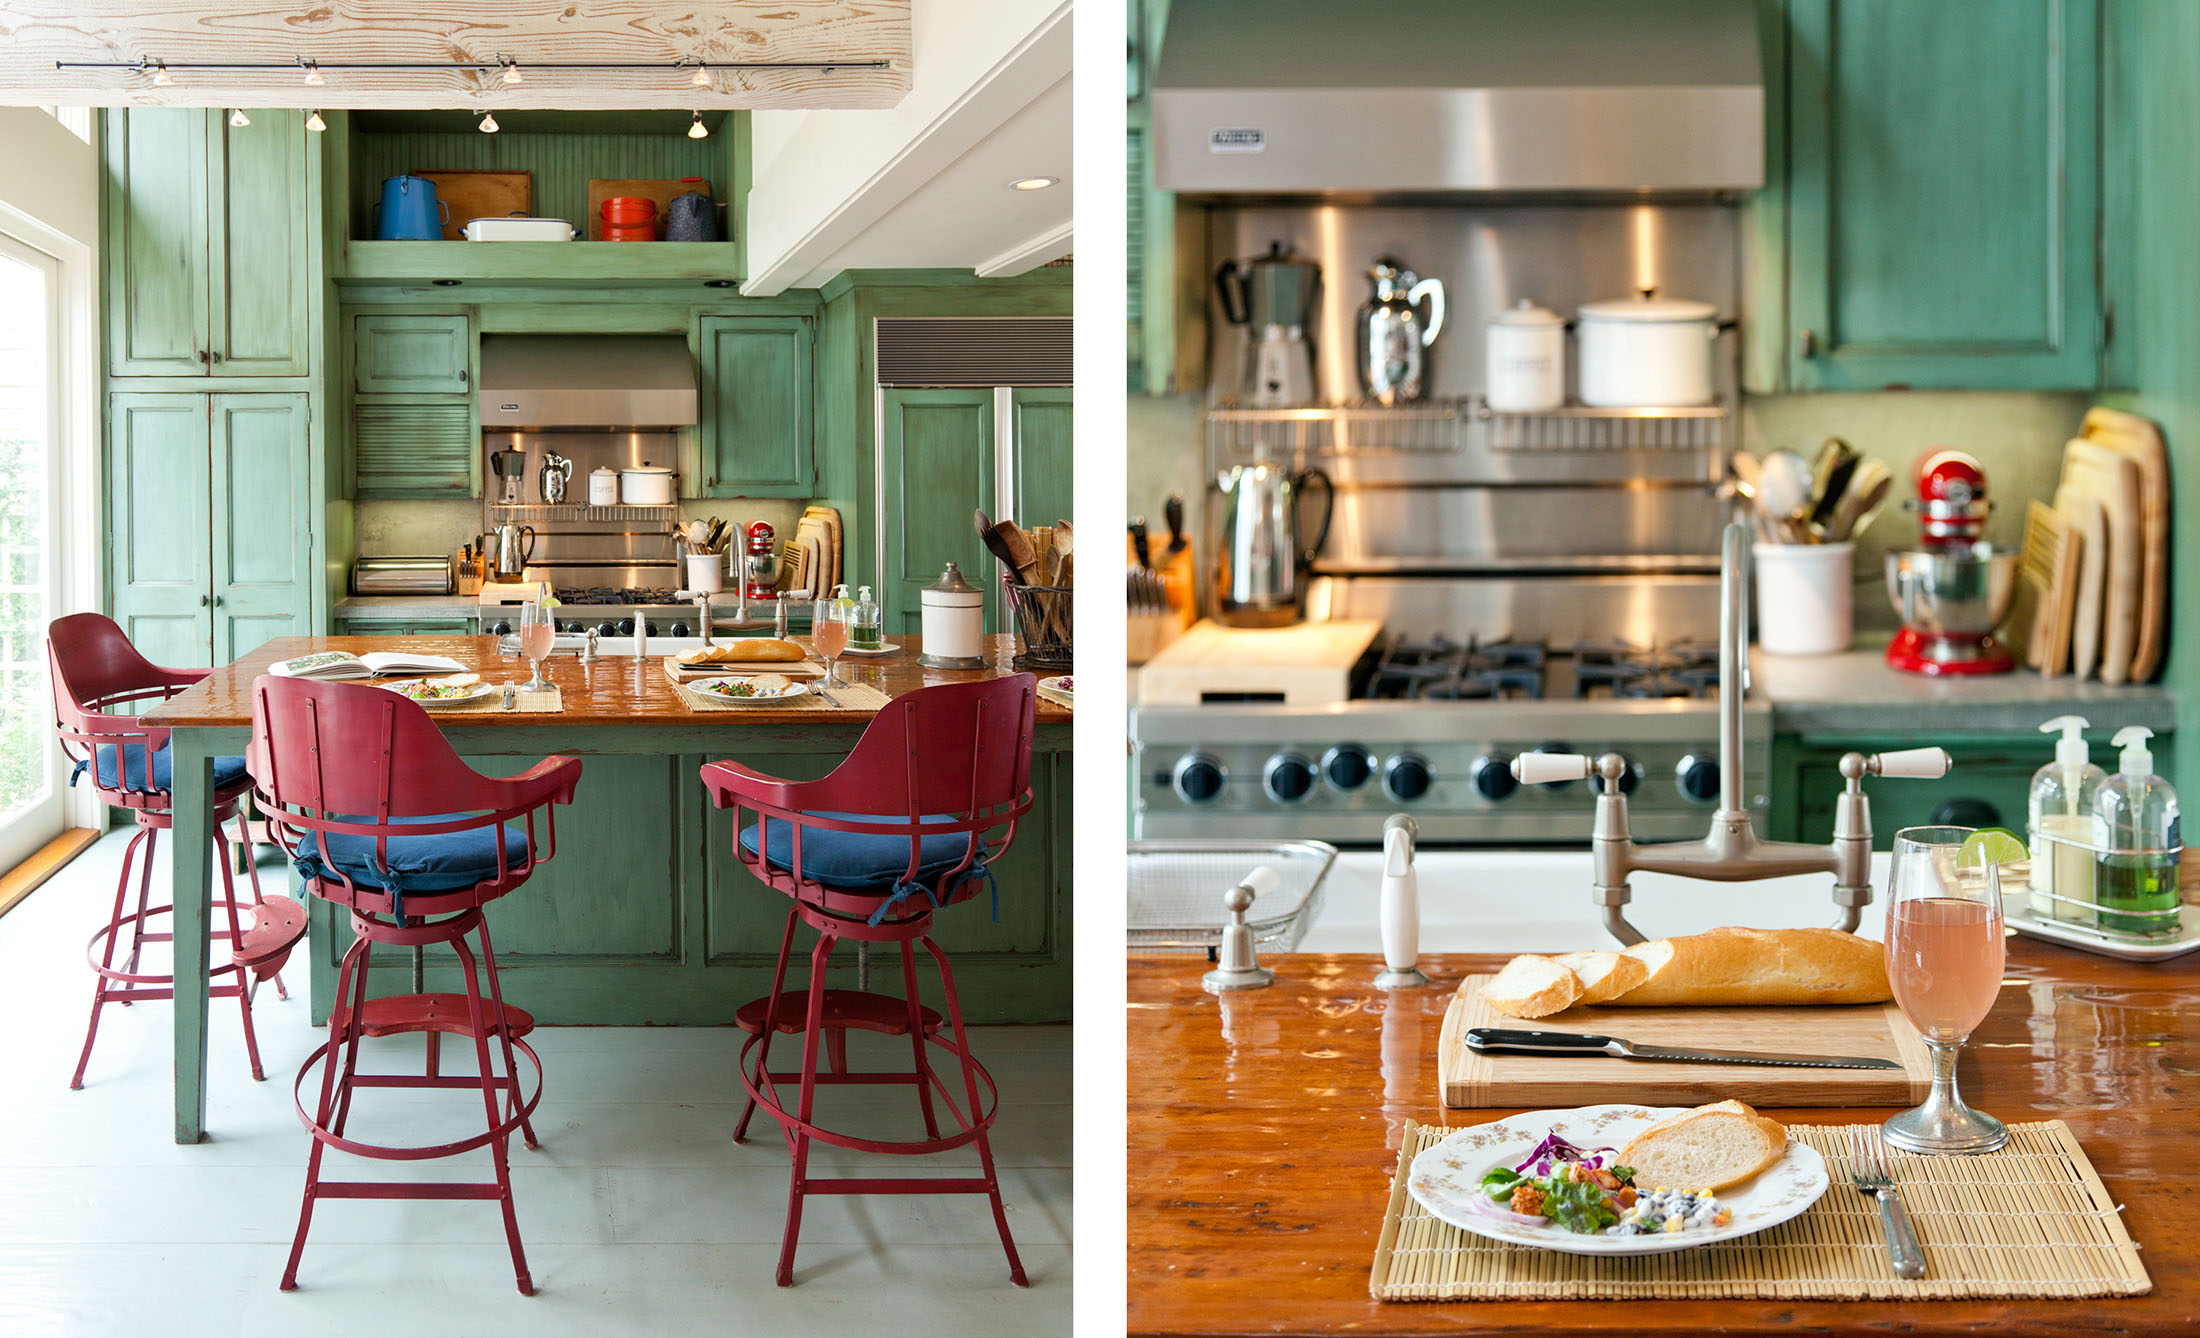 Private Residence  Newport CA  Inspirato   View Full Project